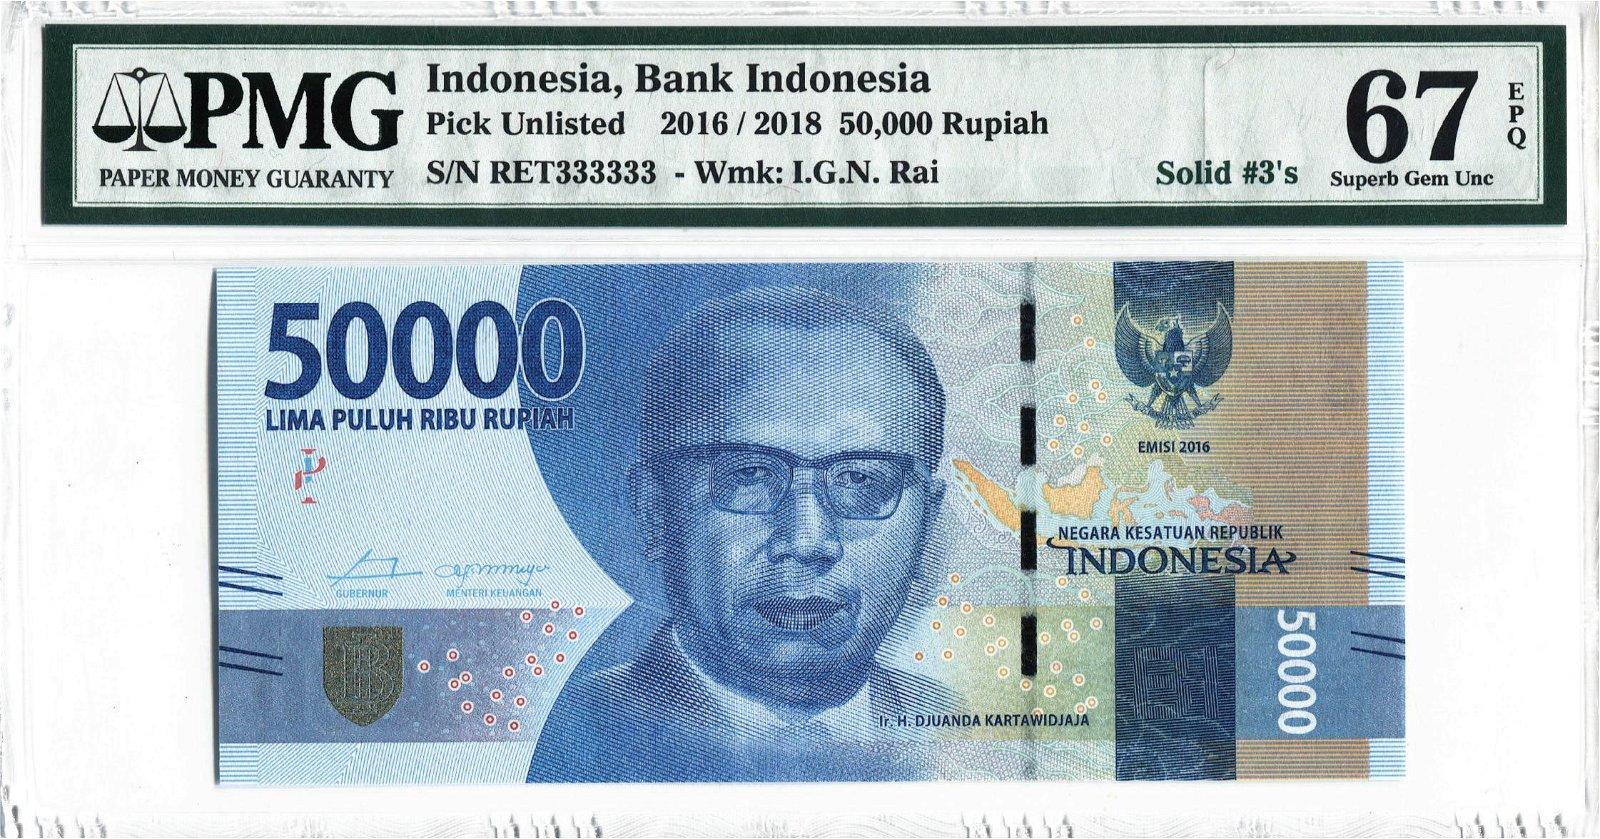 Indonesia 2016/18, 50000 Rupiah Solid 3's RET 333333,